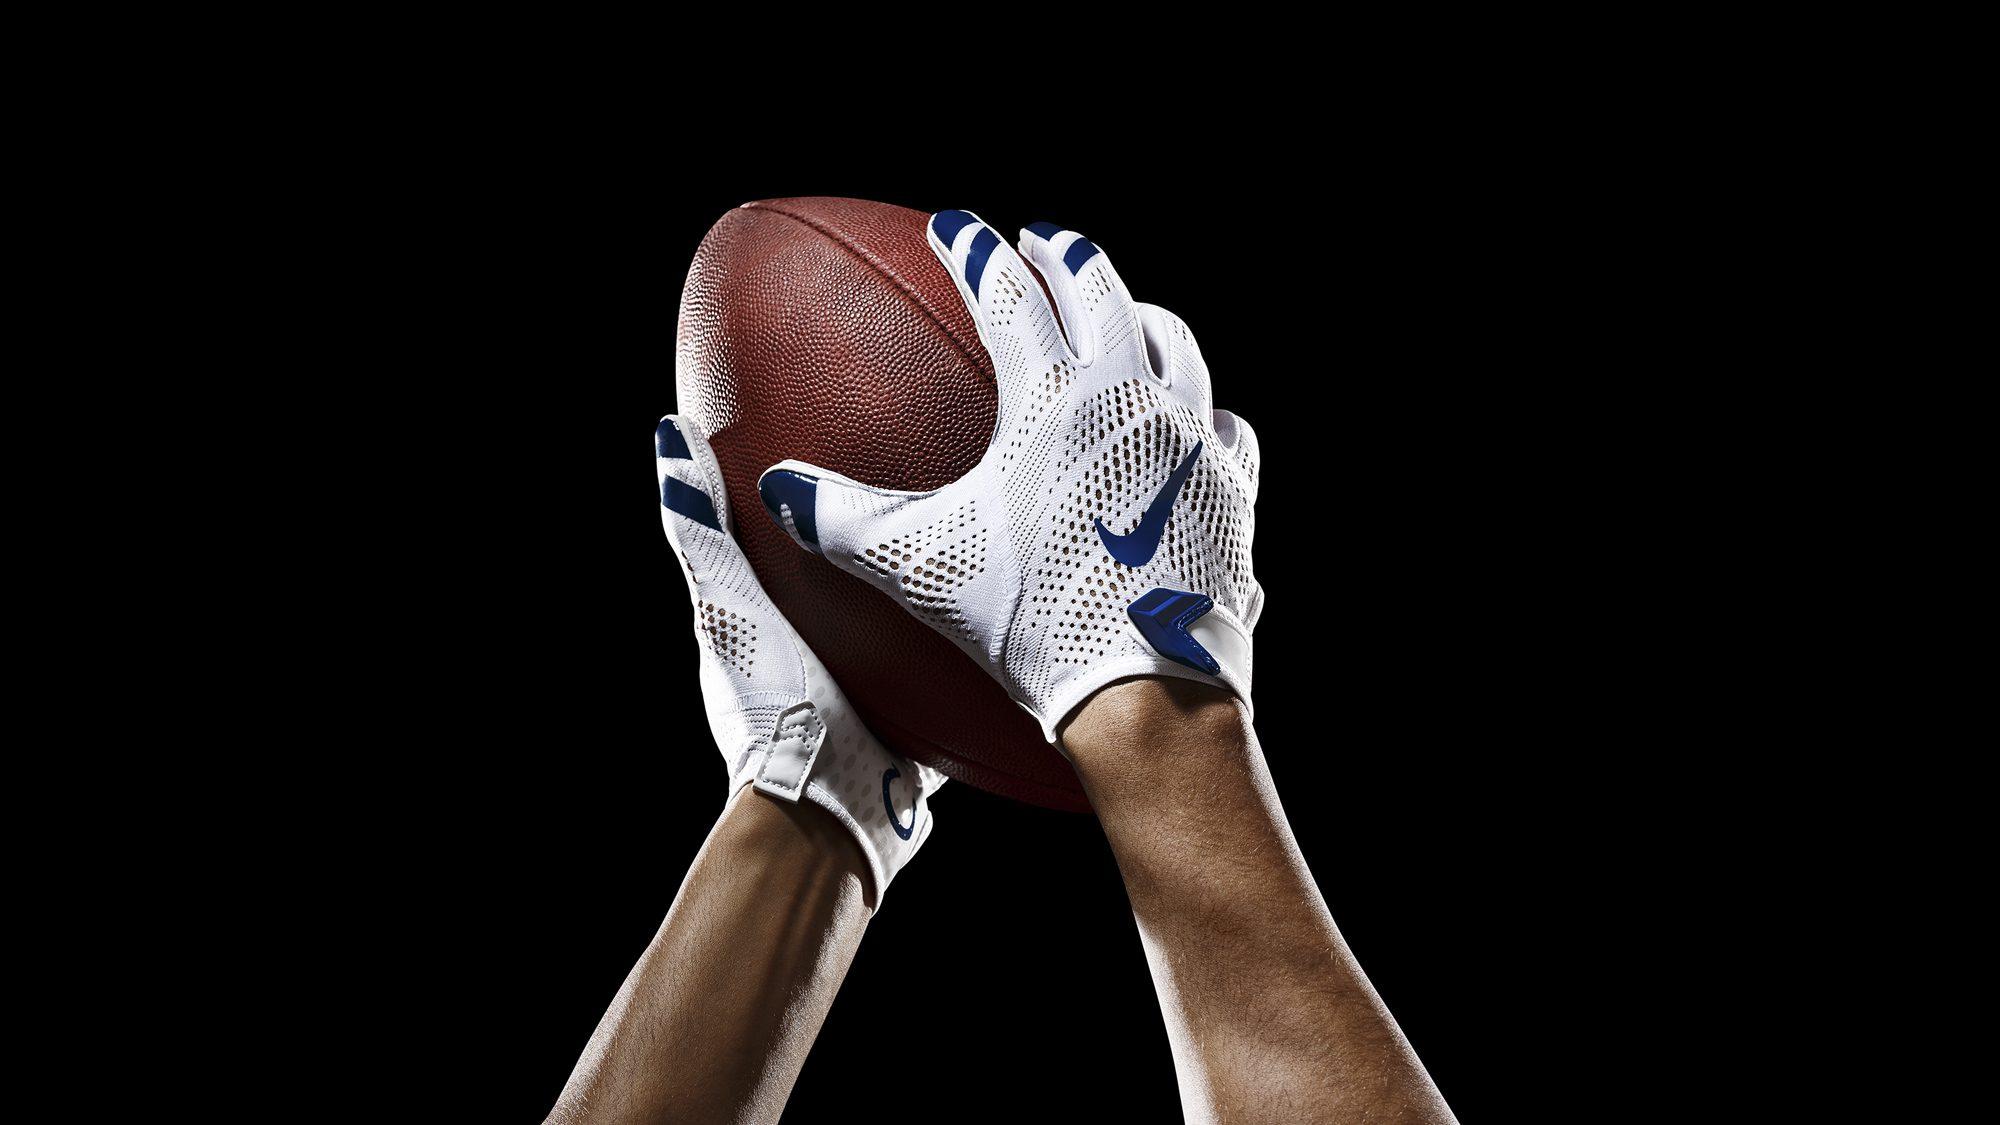 SP14_NFL_SB_TeamGloves_Ball_Colts_36853